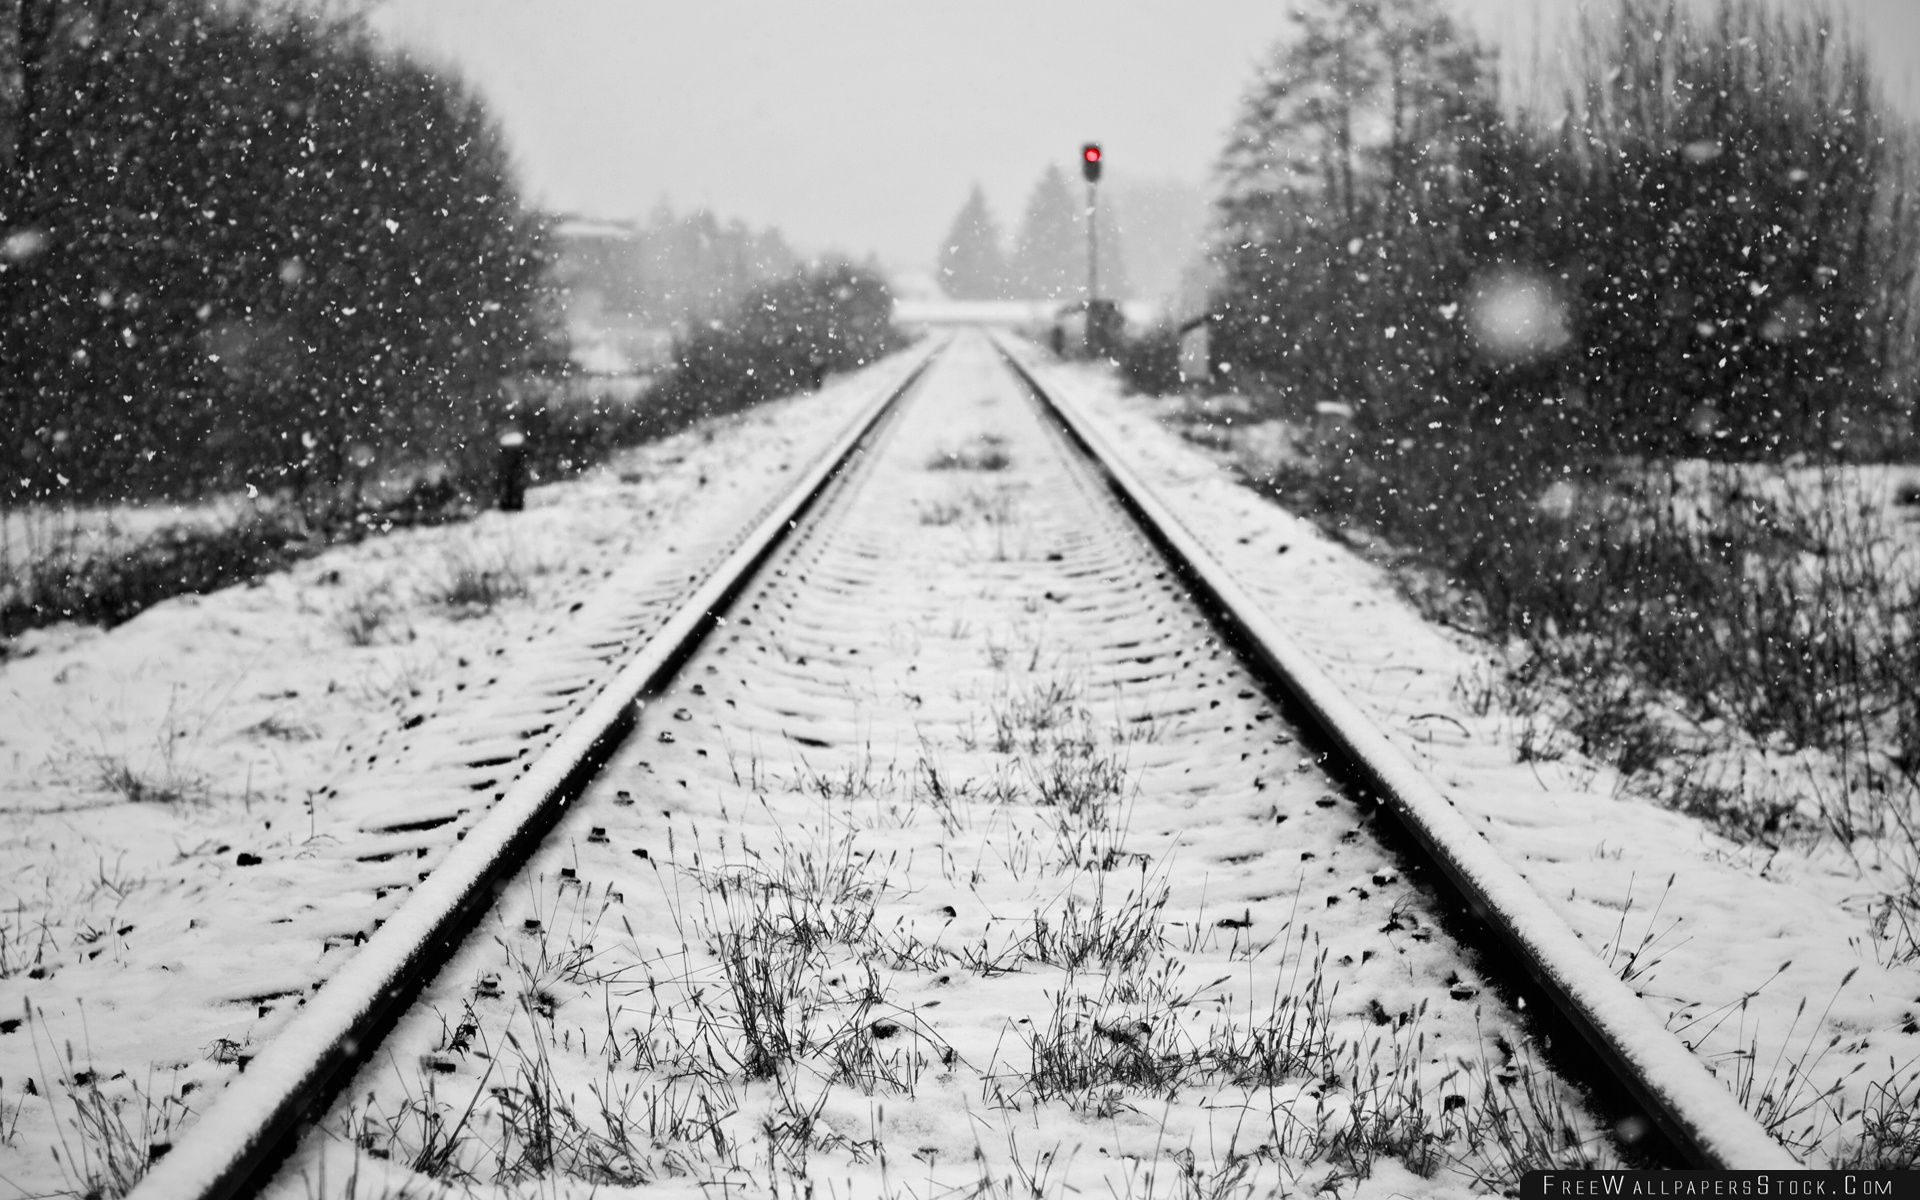 Download Free Wallpaper Winter Travel